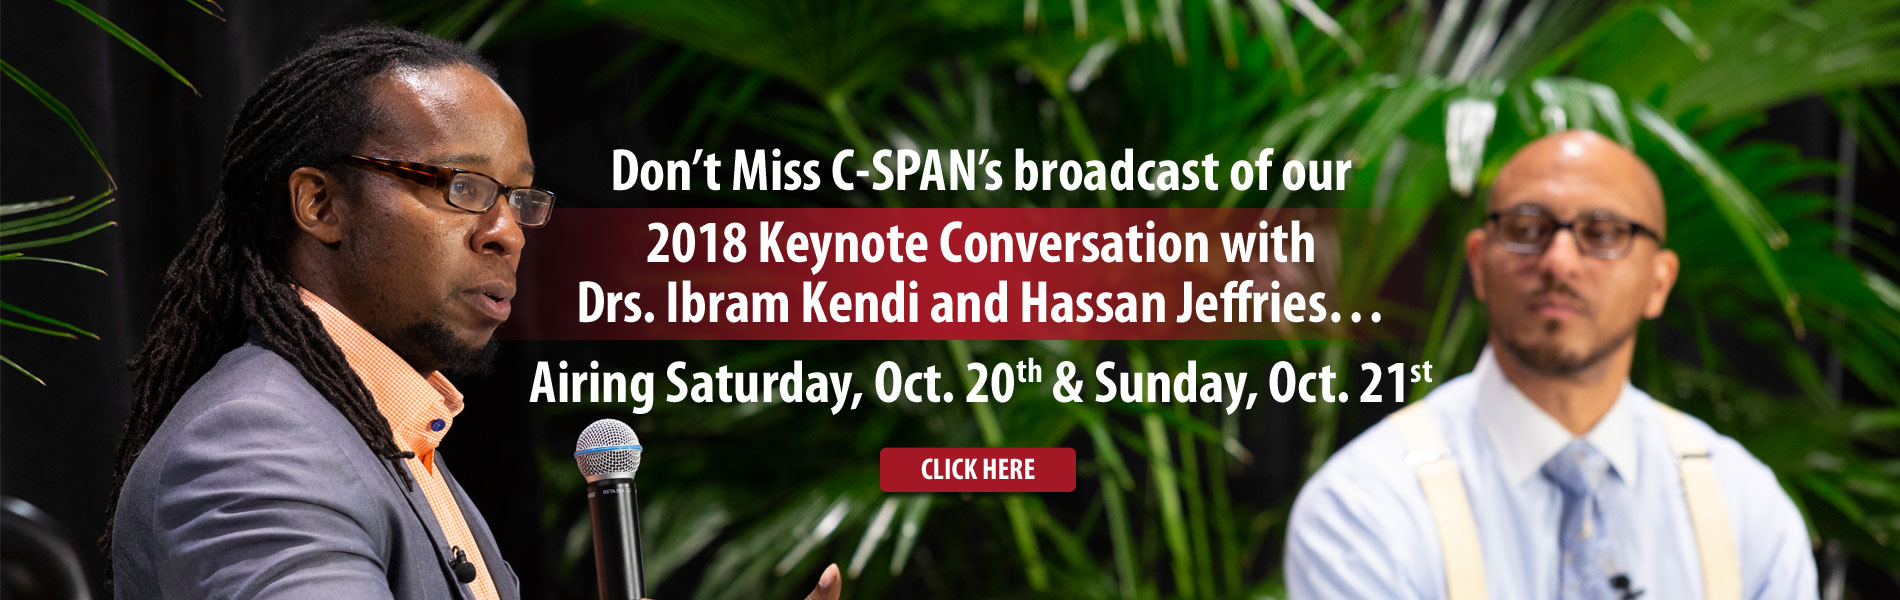 Keynote Conversation with Drs. Ibram Kendi and Hassan Jeffries